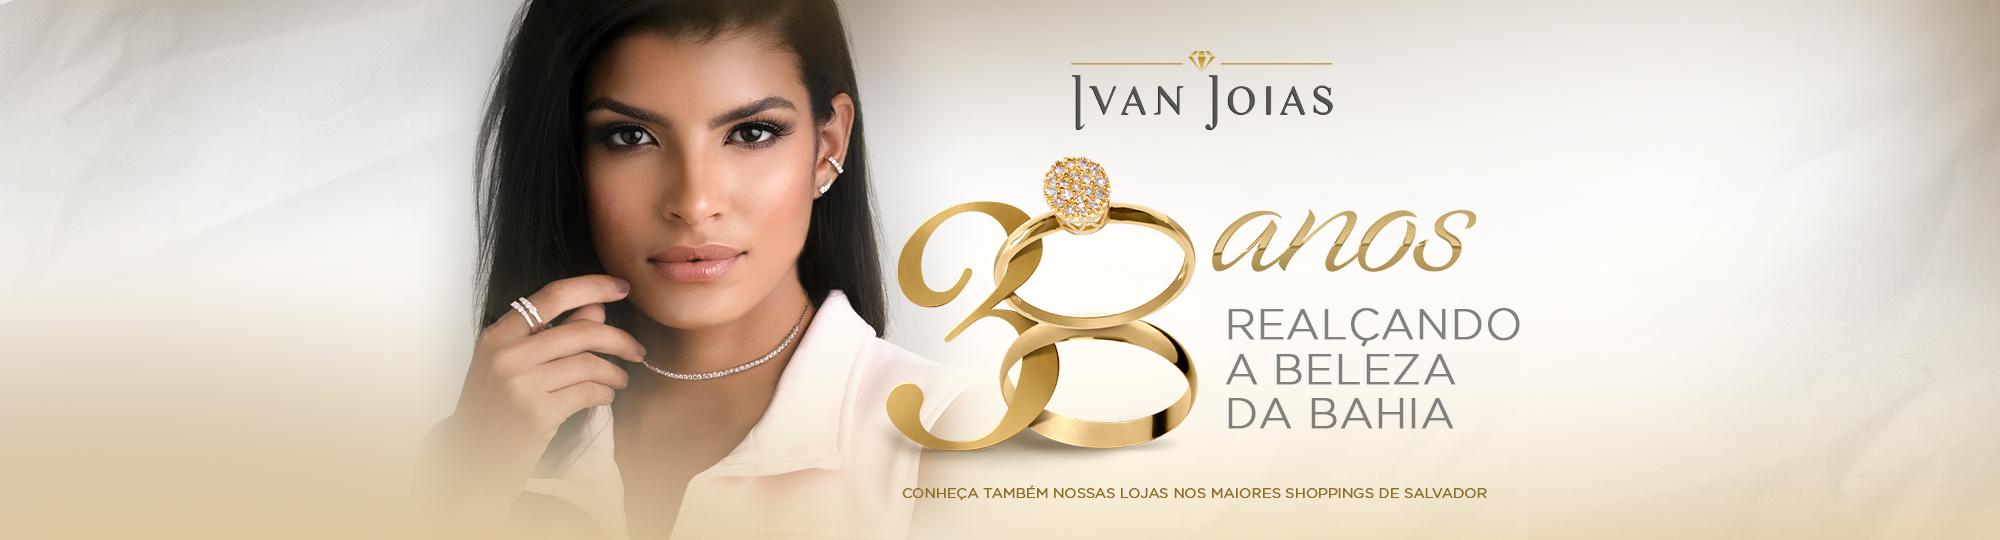 Ivan Joias 38 Anos